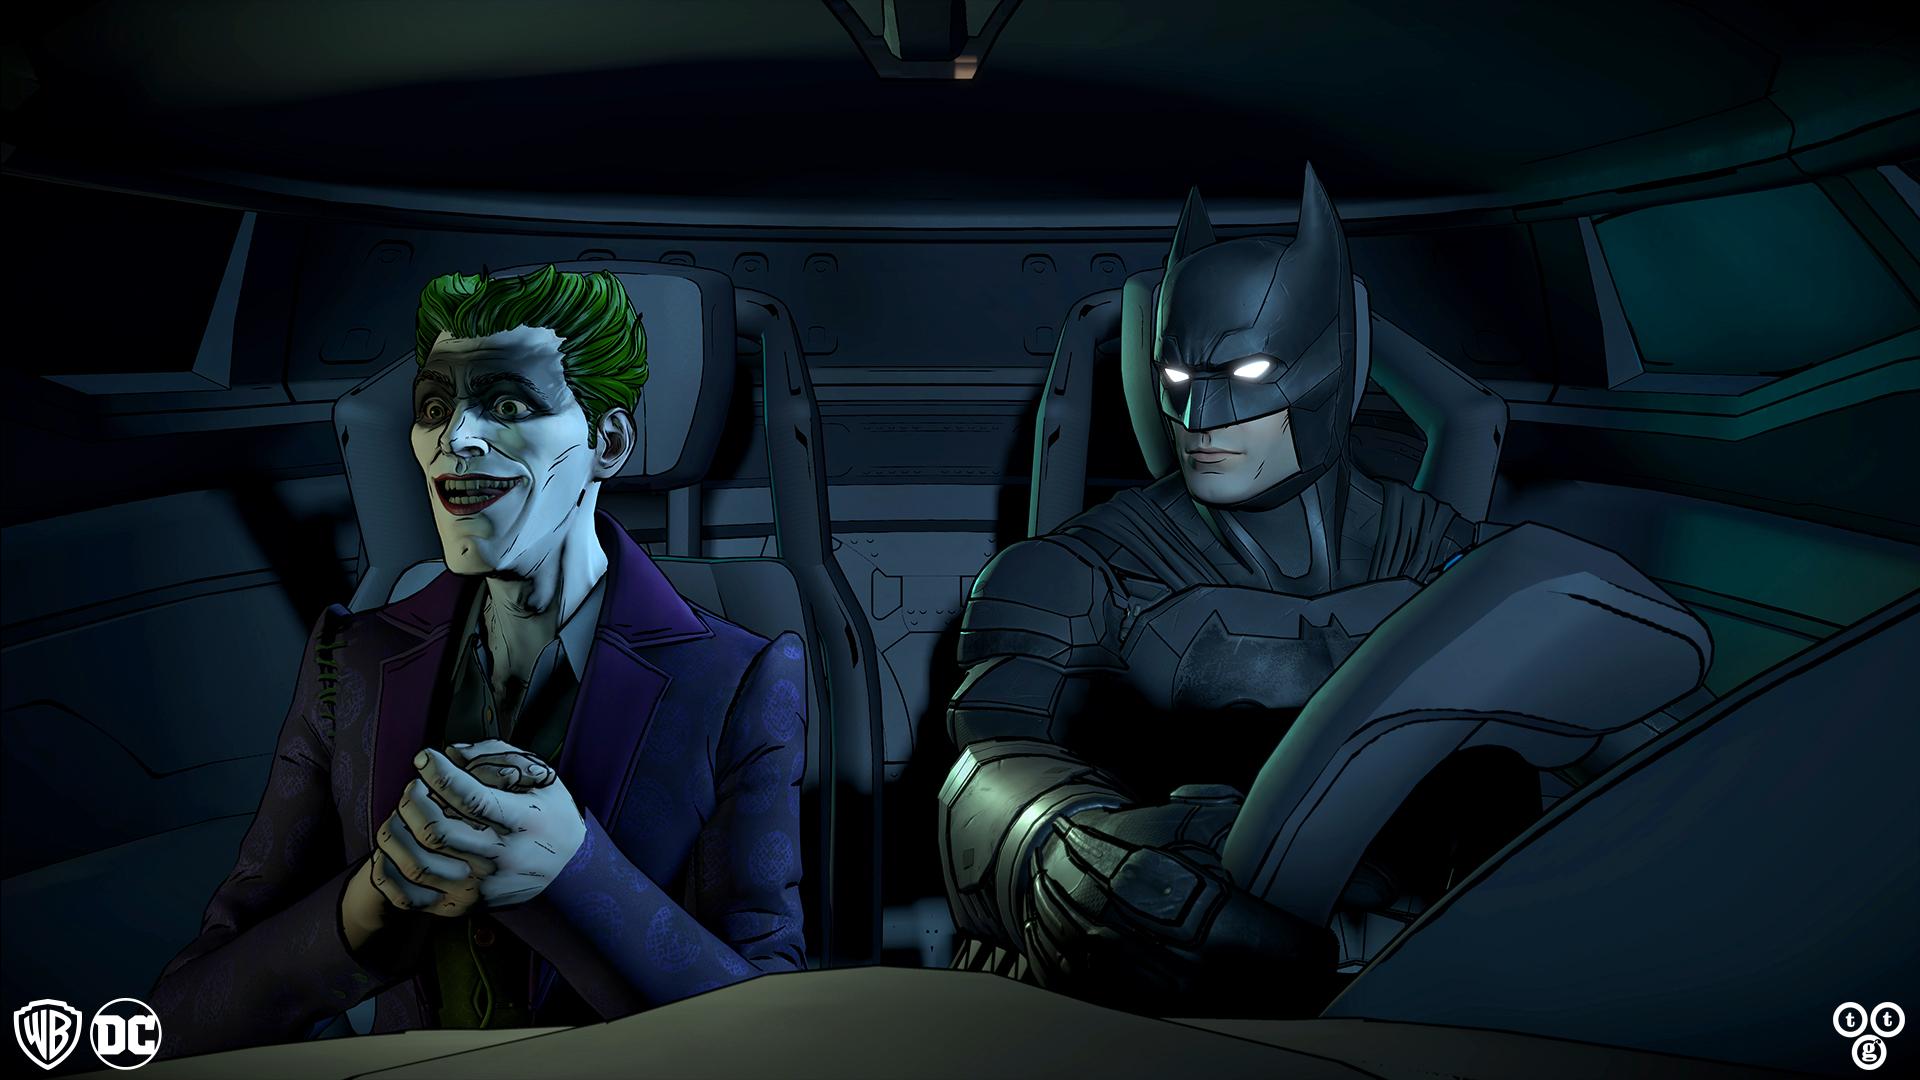 Последний эпизод Batman: The Enemy Within выйдет 27 марта